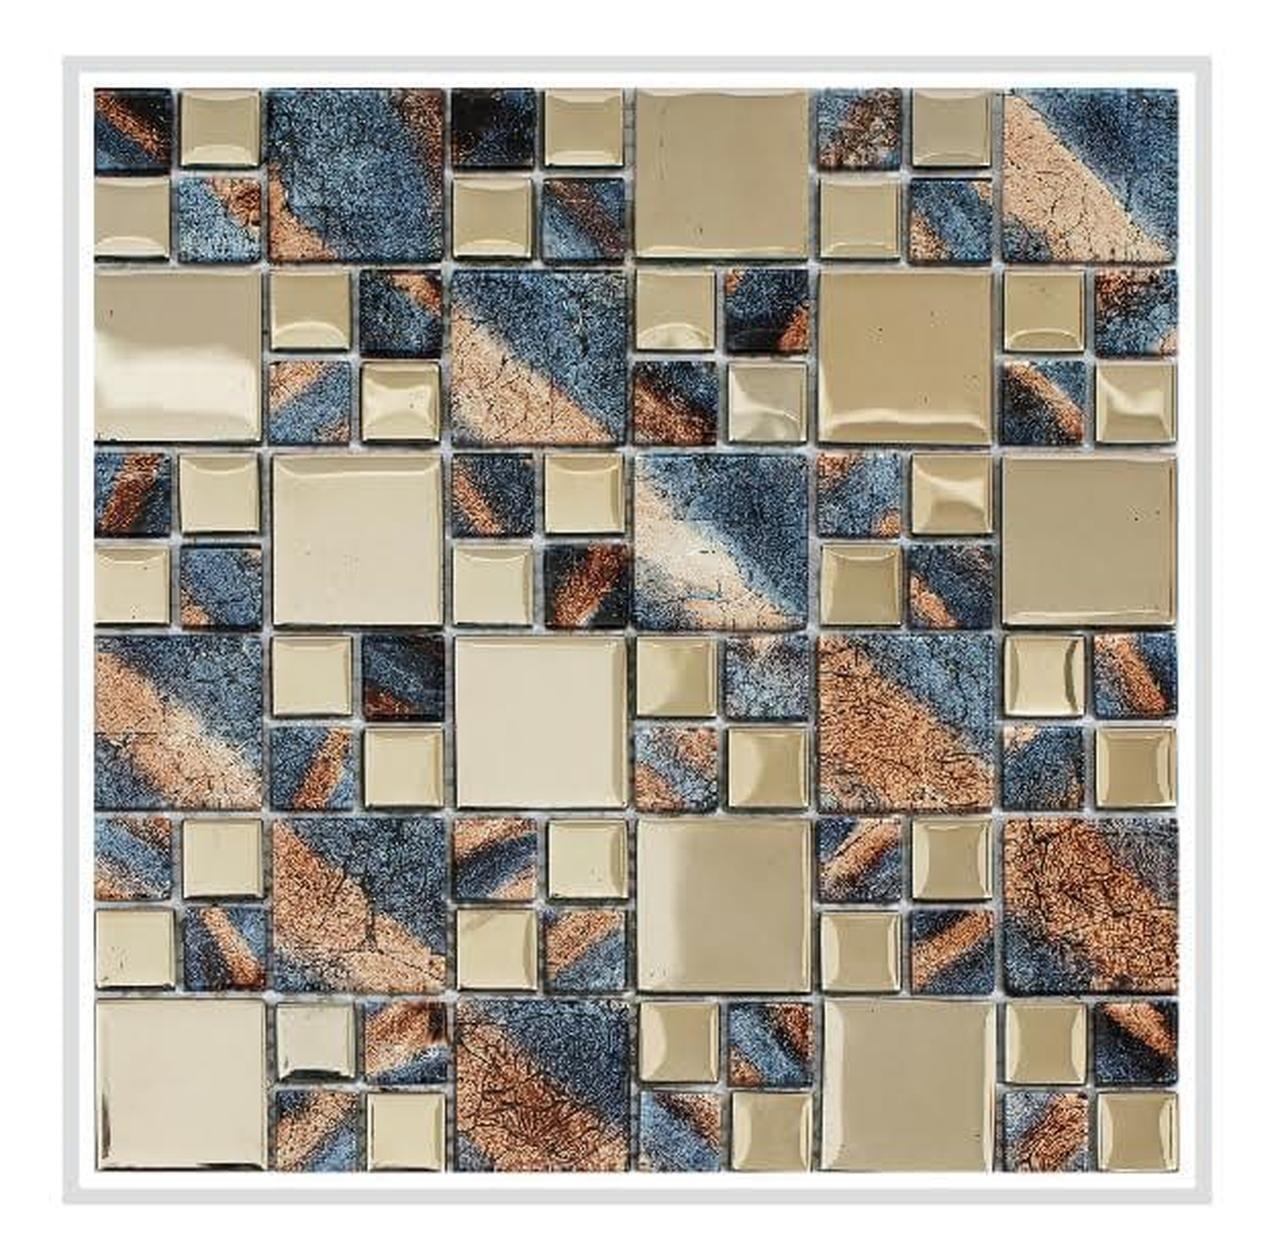 Rousha Purple And Silver 12x12 Glass Mosaic In 2020 Glass Mosaic Backsplash Mosaic Bathroom Tile Copper Mosaic Backsplash